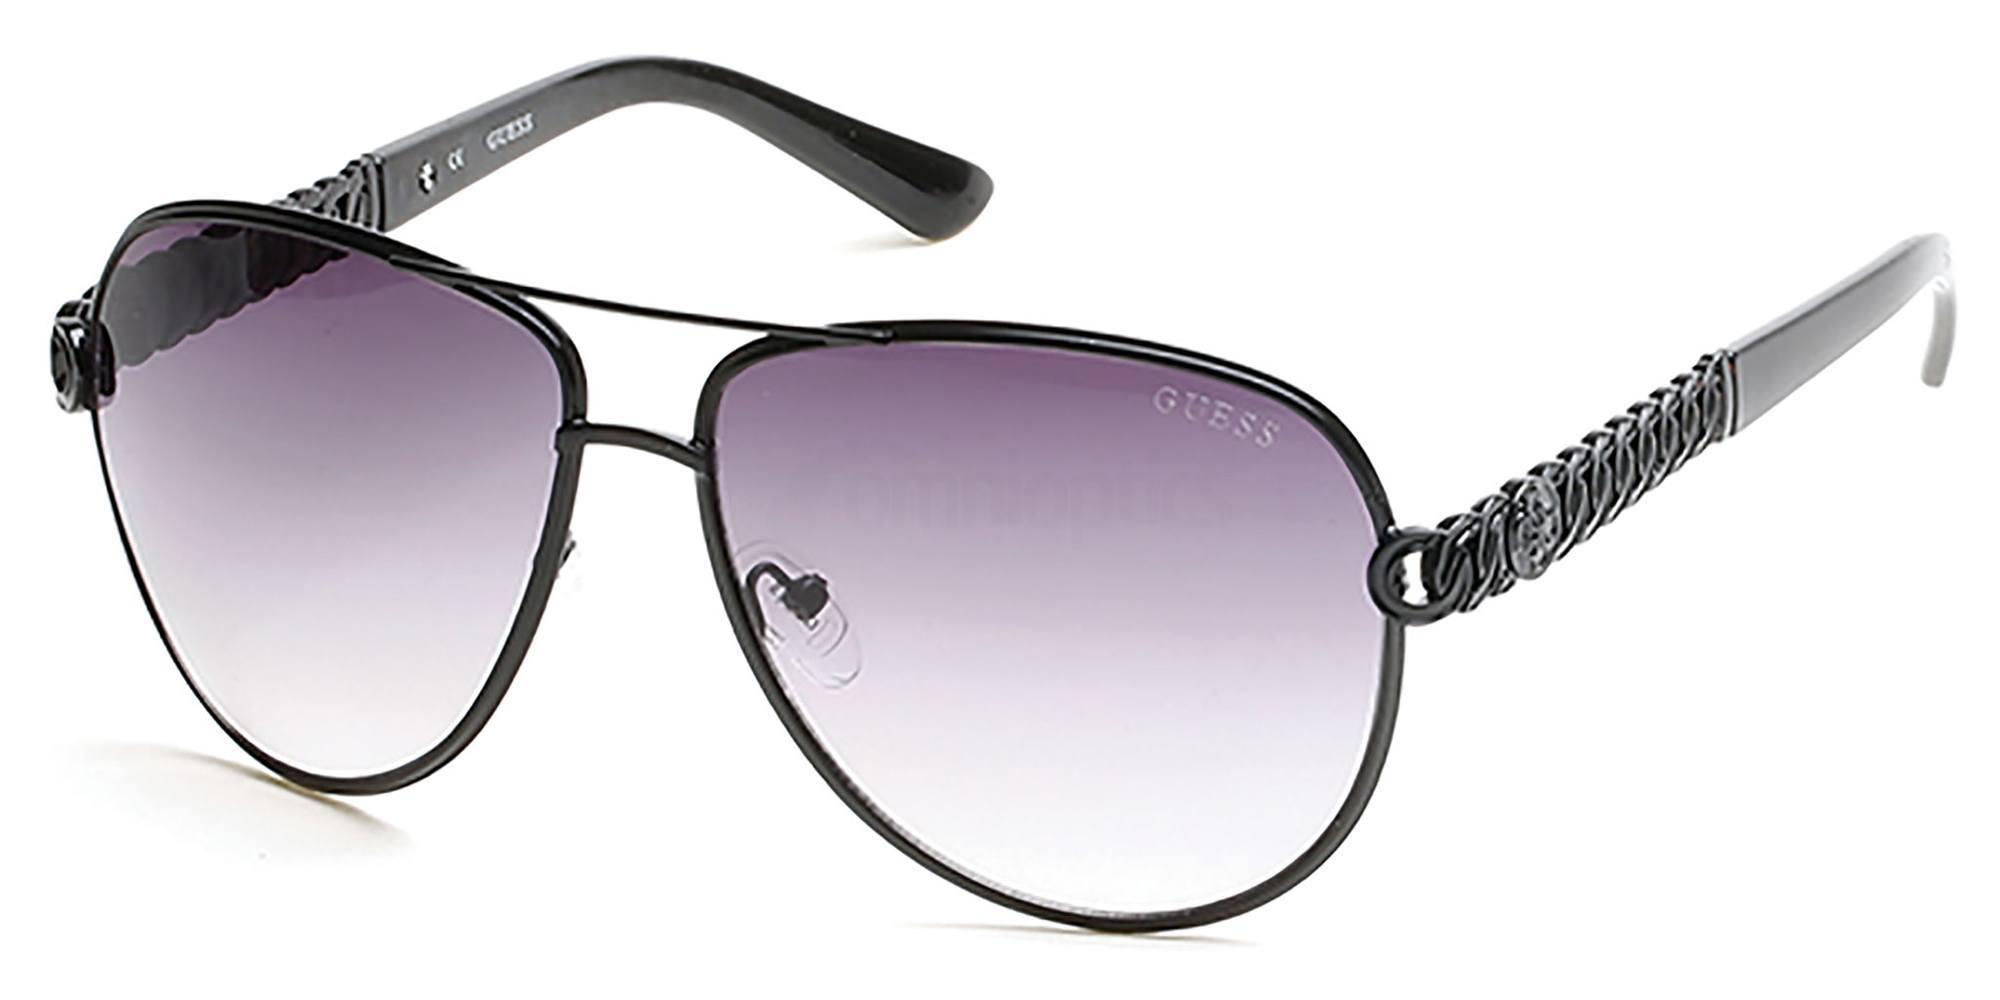 01B GU7404 Sunglasses, Guess